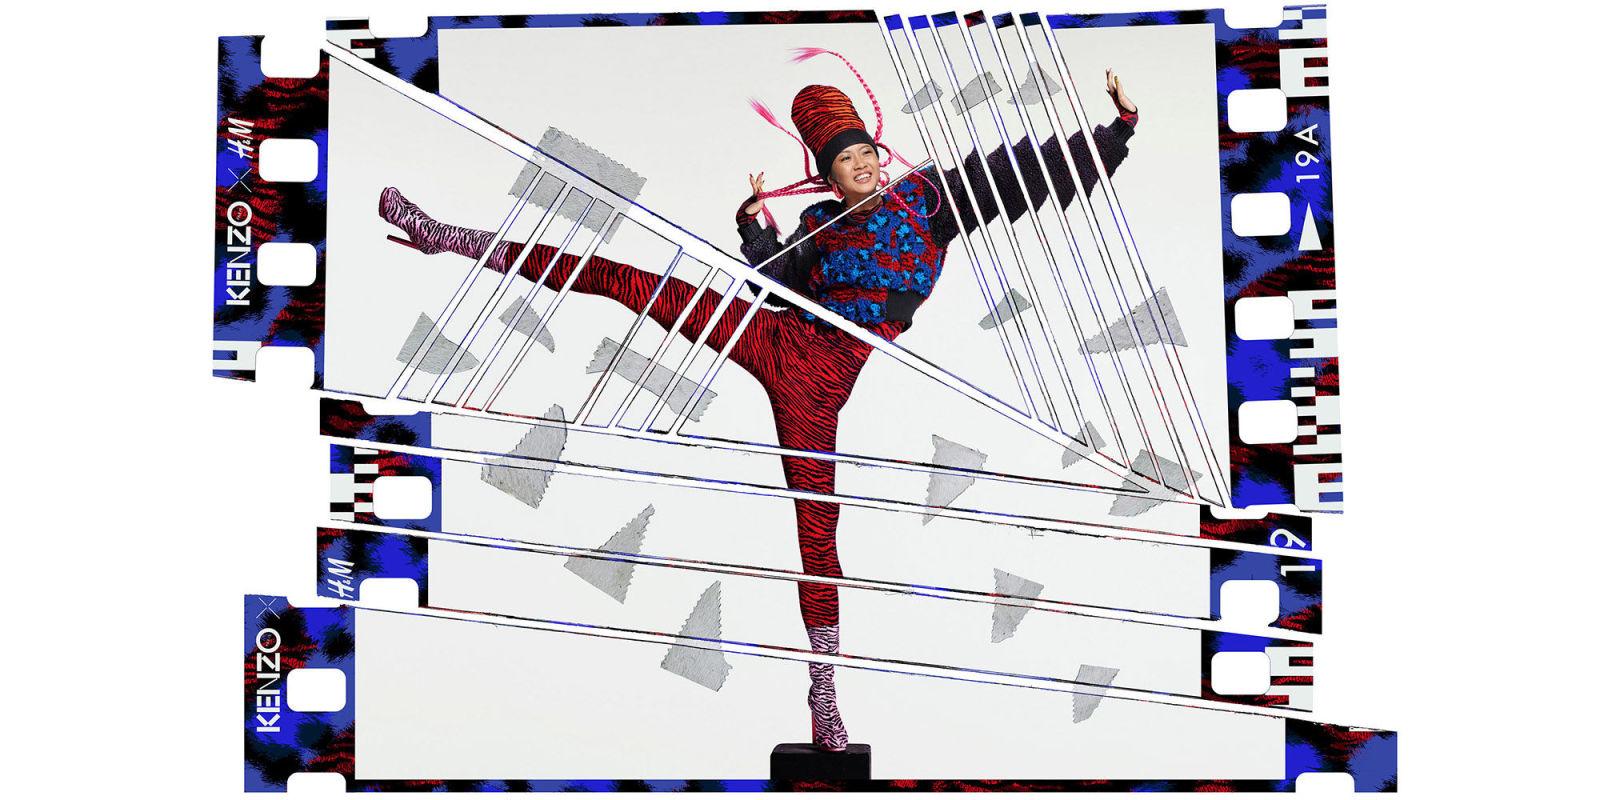 Kenzo H&M - Jean Paul Goude